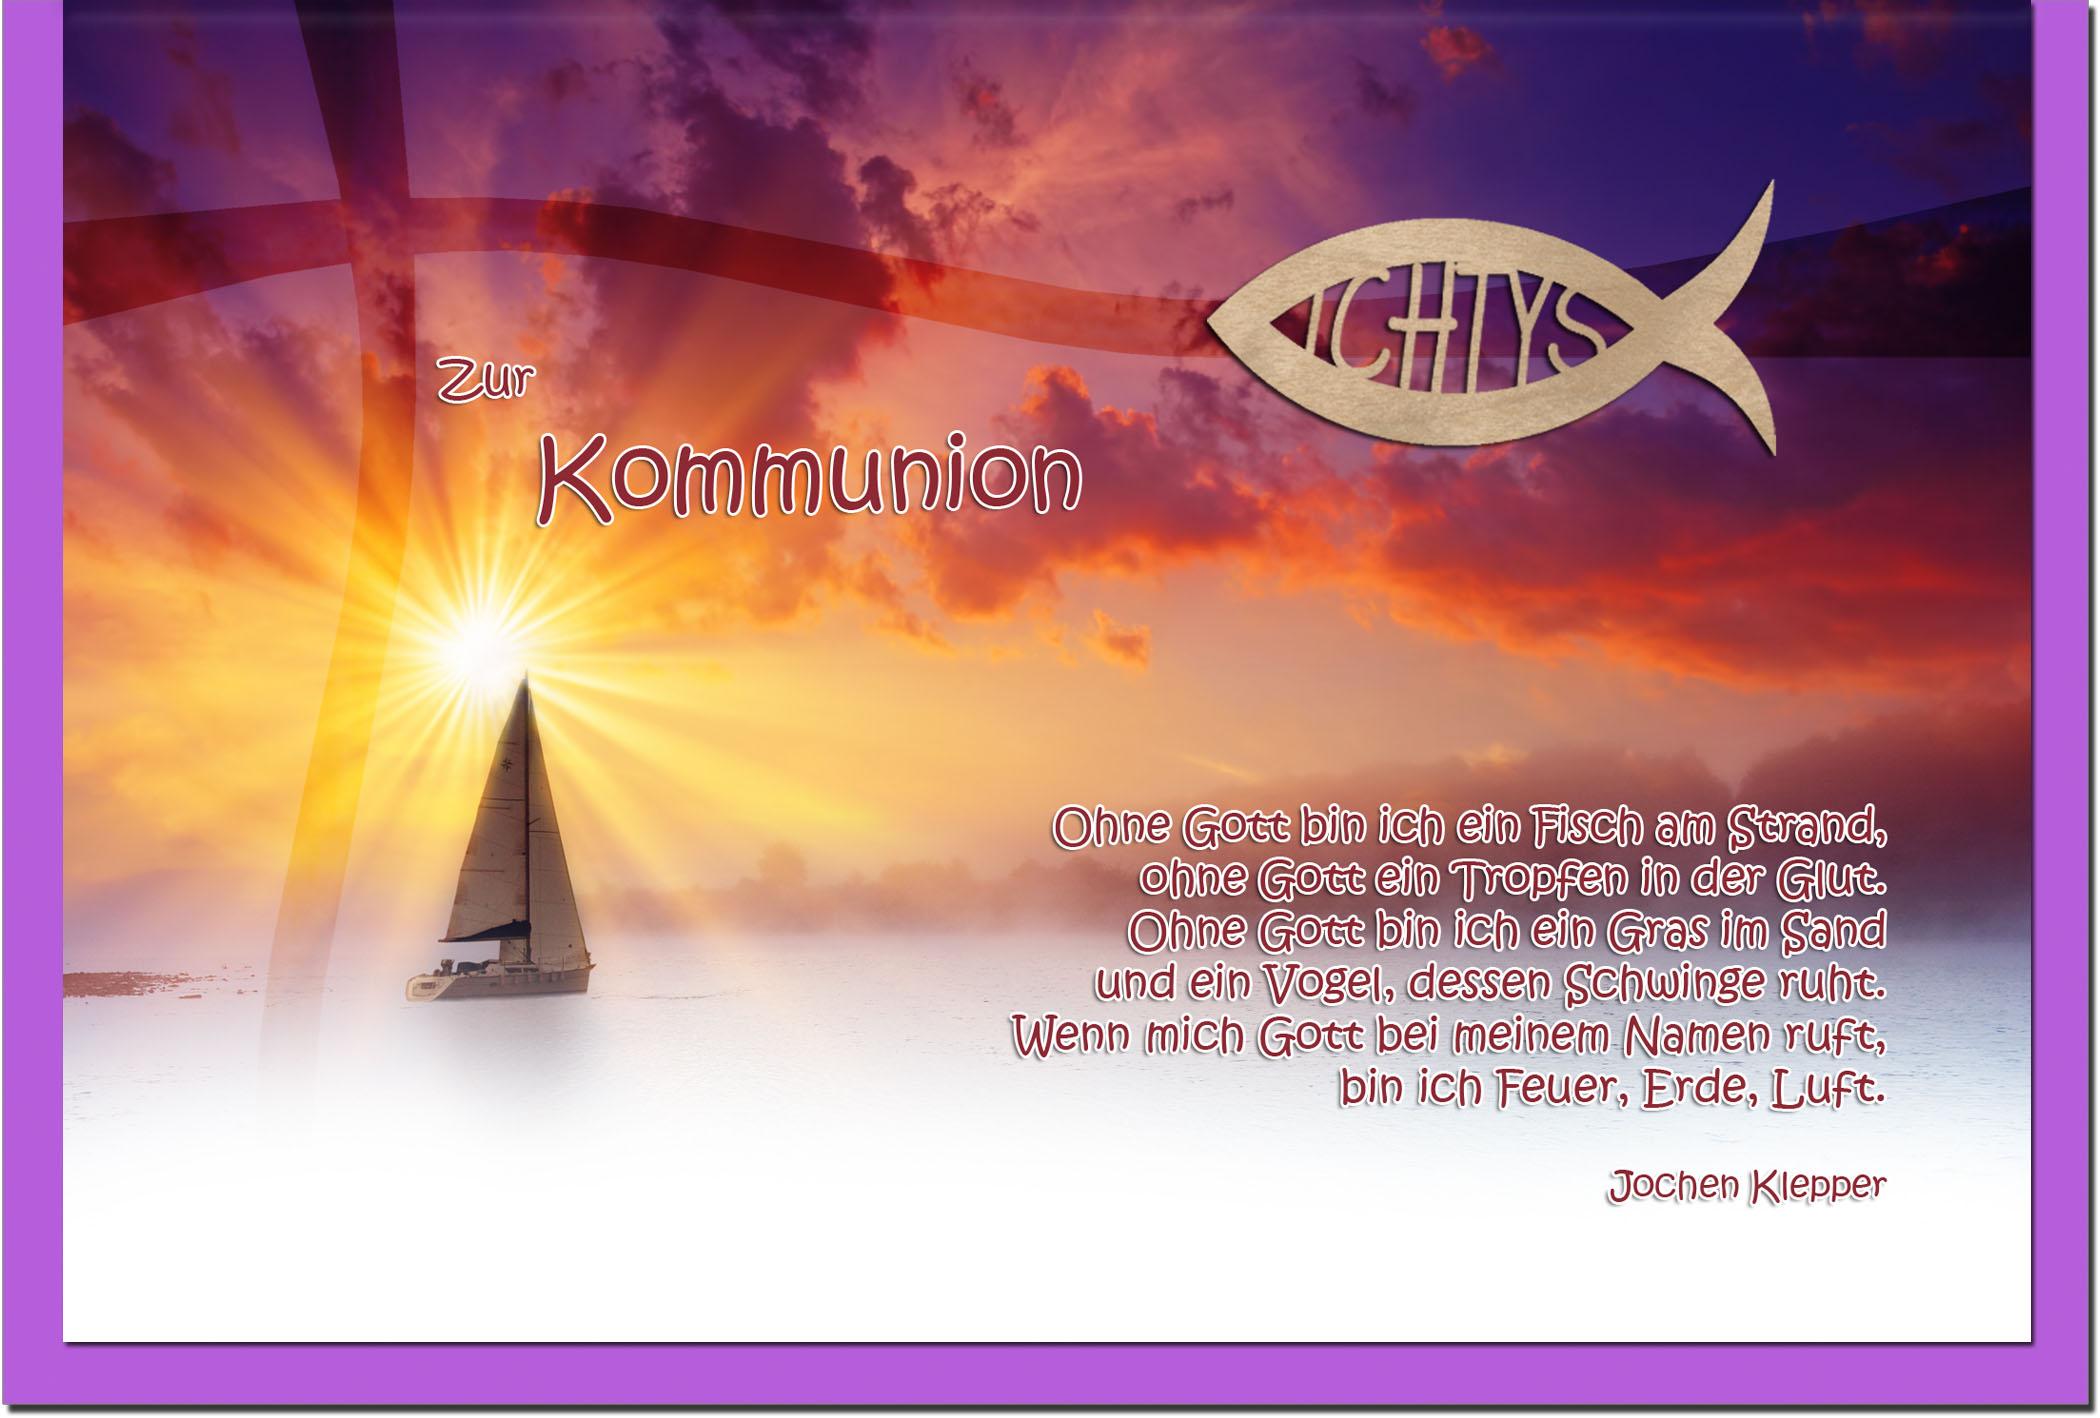 Kommunionskarten / Grußkarten / Glückwunschkarten /Kommunion Segelboot